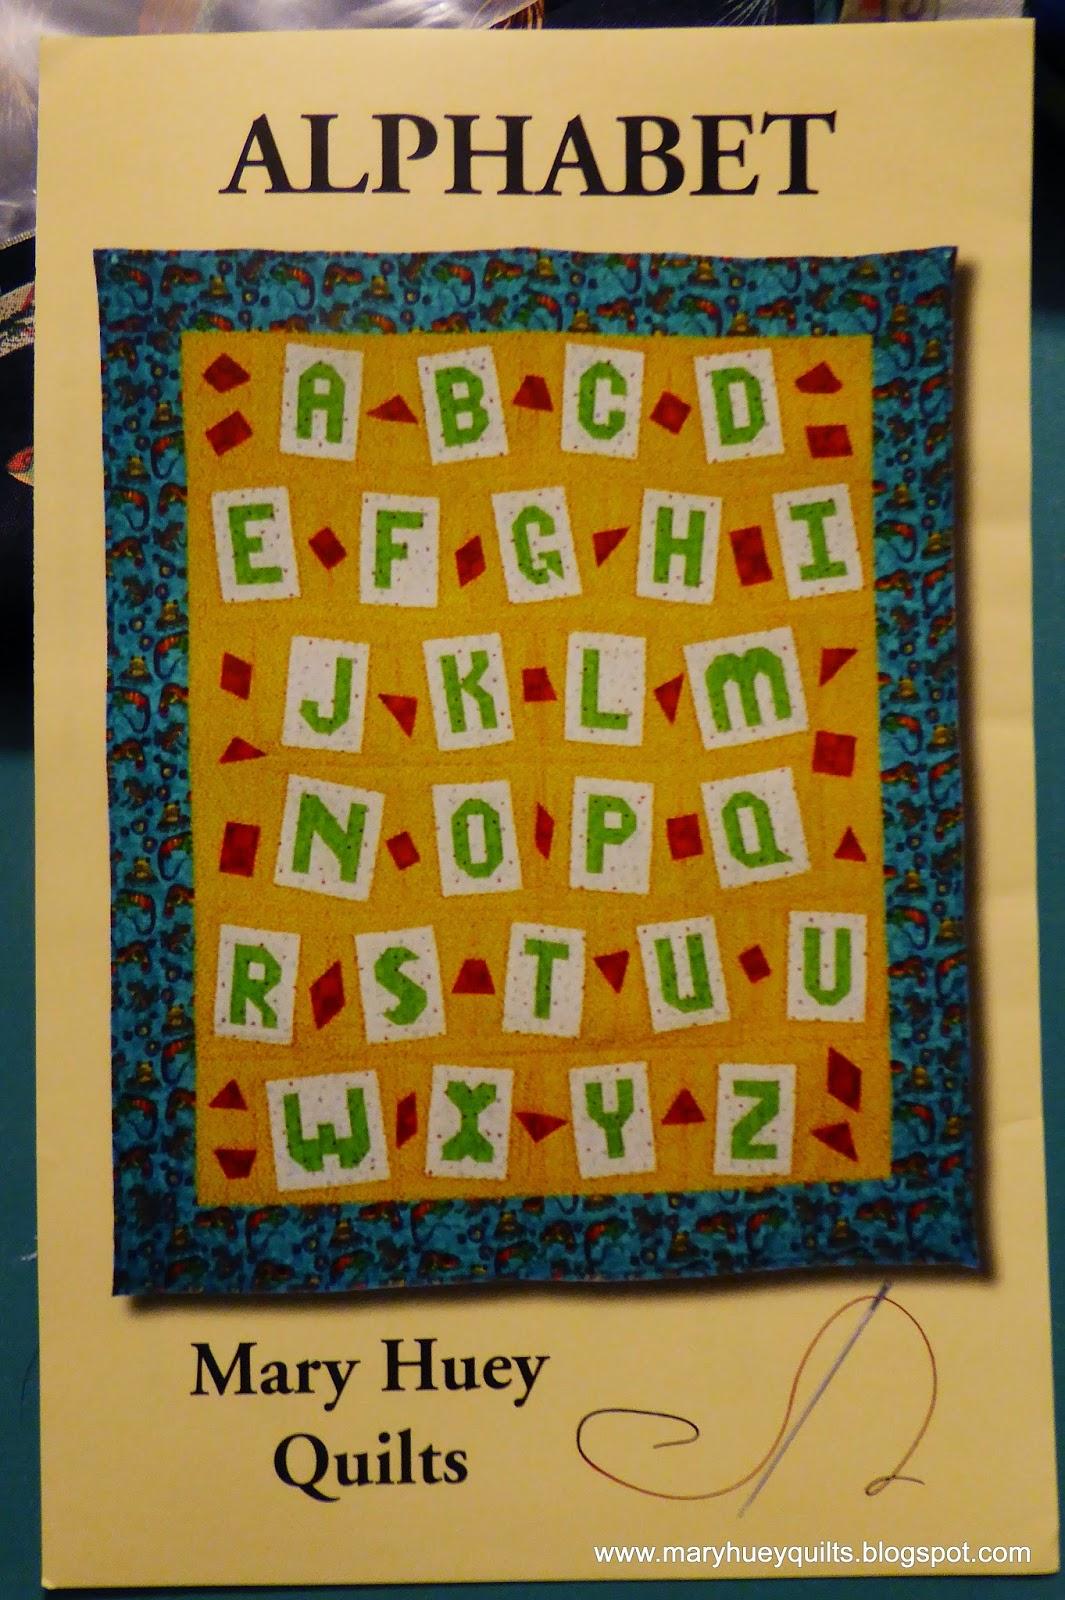 http://www.maryhueyquilts.com/catalog/i10.html